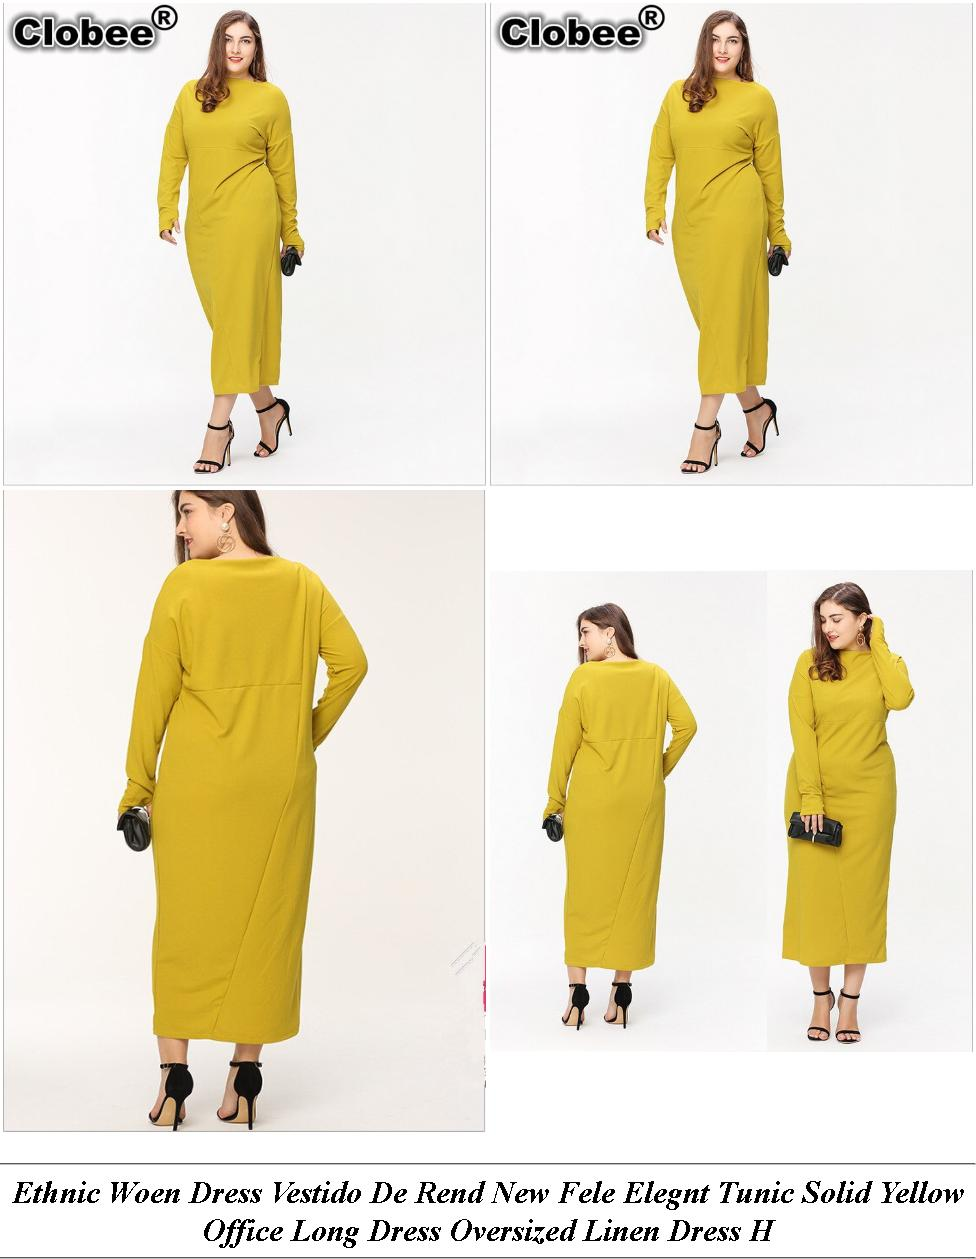 Junior Prom Dresses - Clothing Sales - Sequin Dress - Cheap Designer Clothes Womens